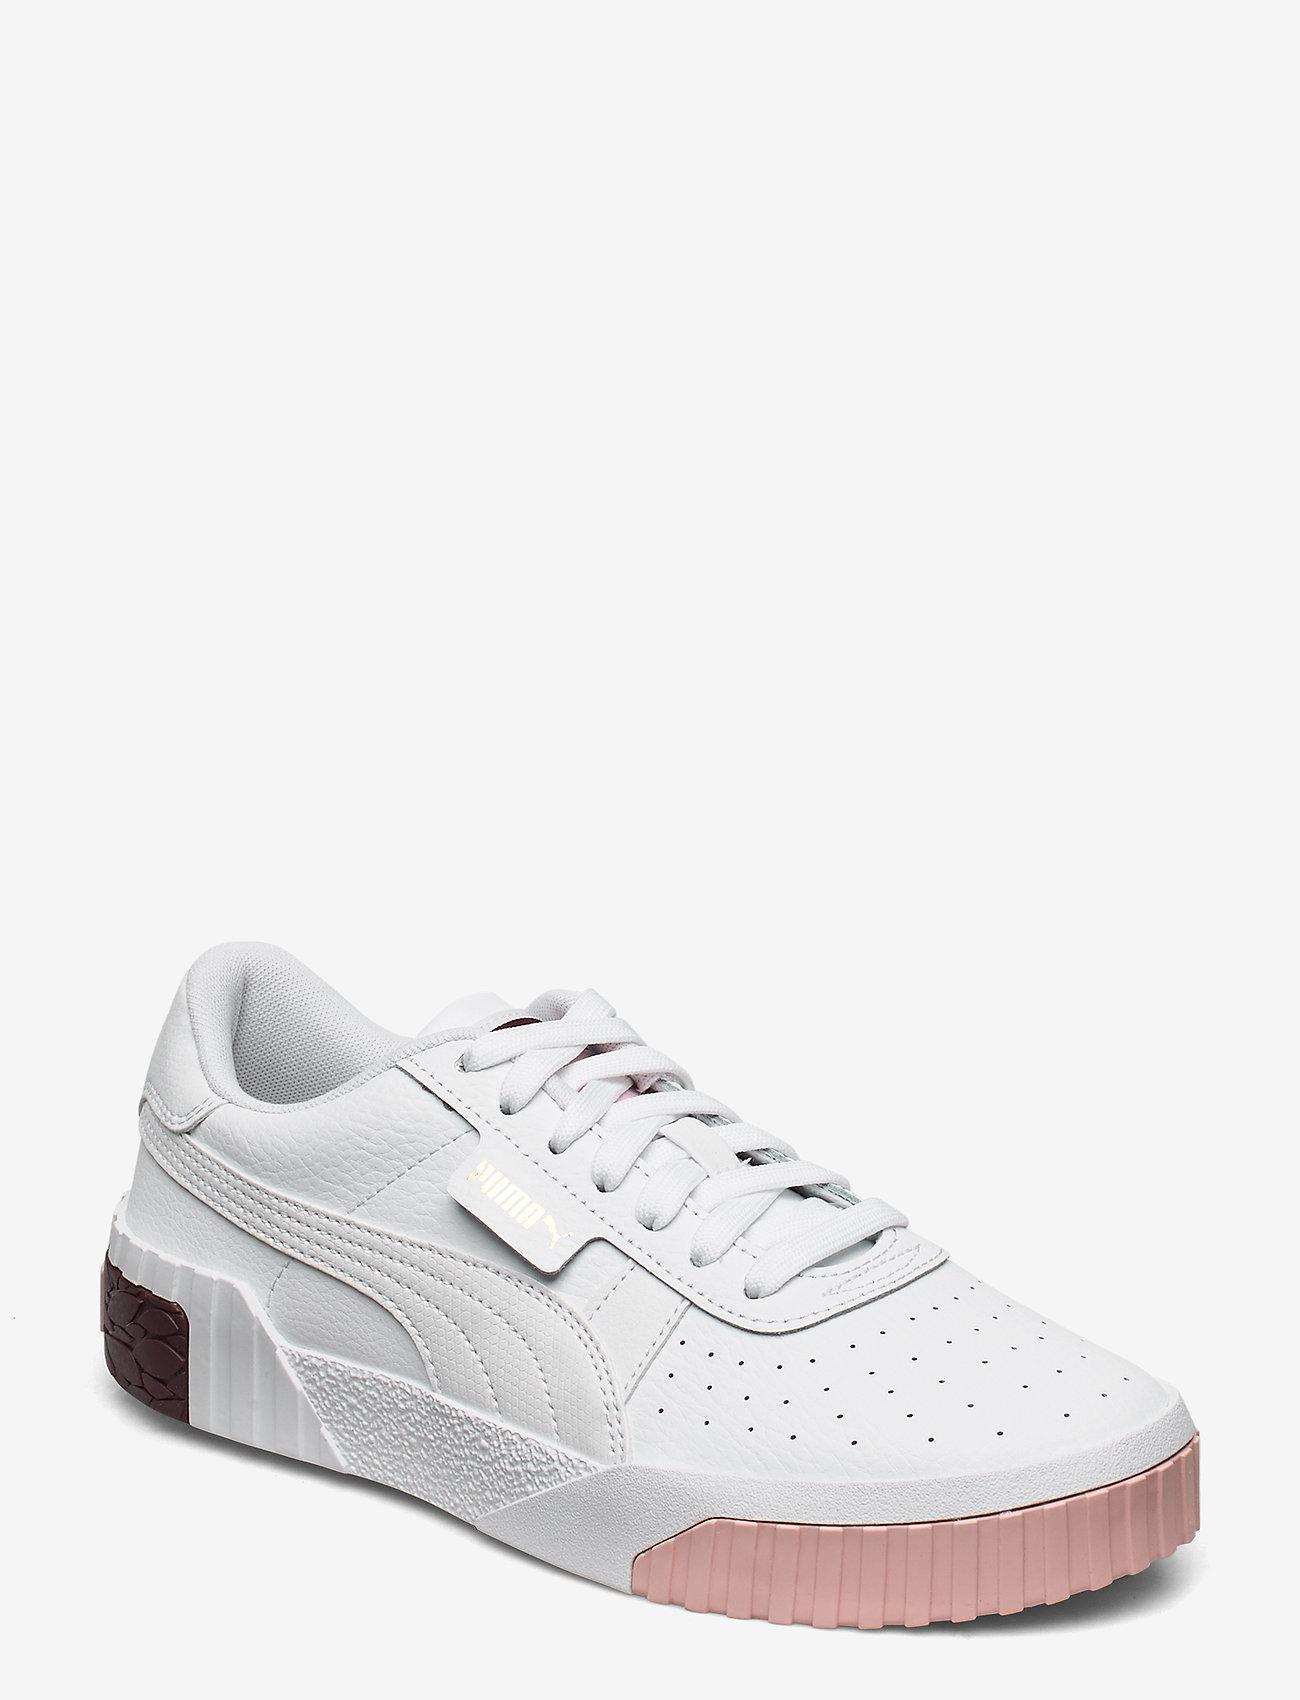 Cali Jr (Puma White-burgundy) (42